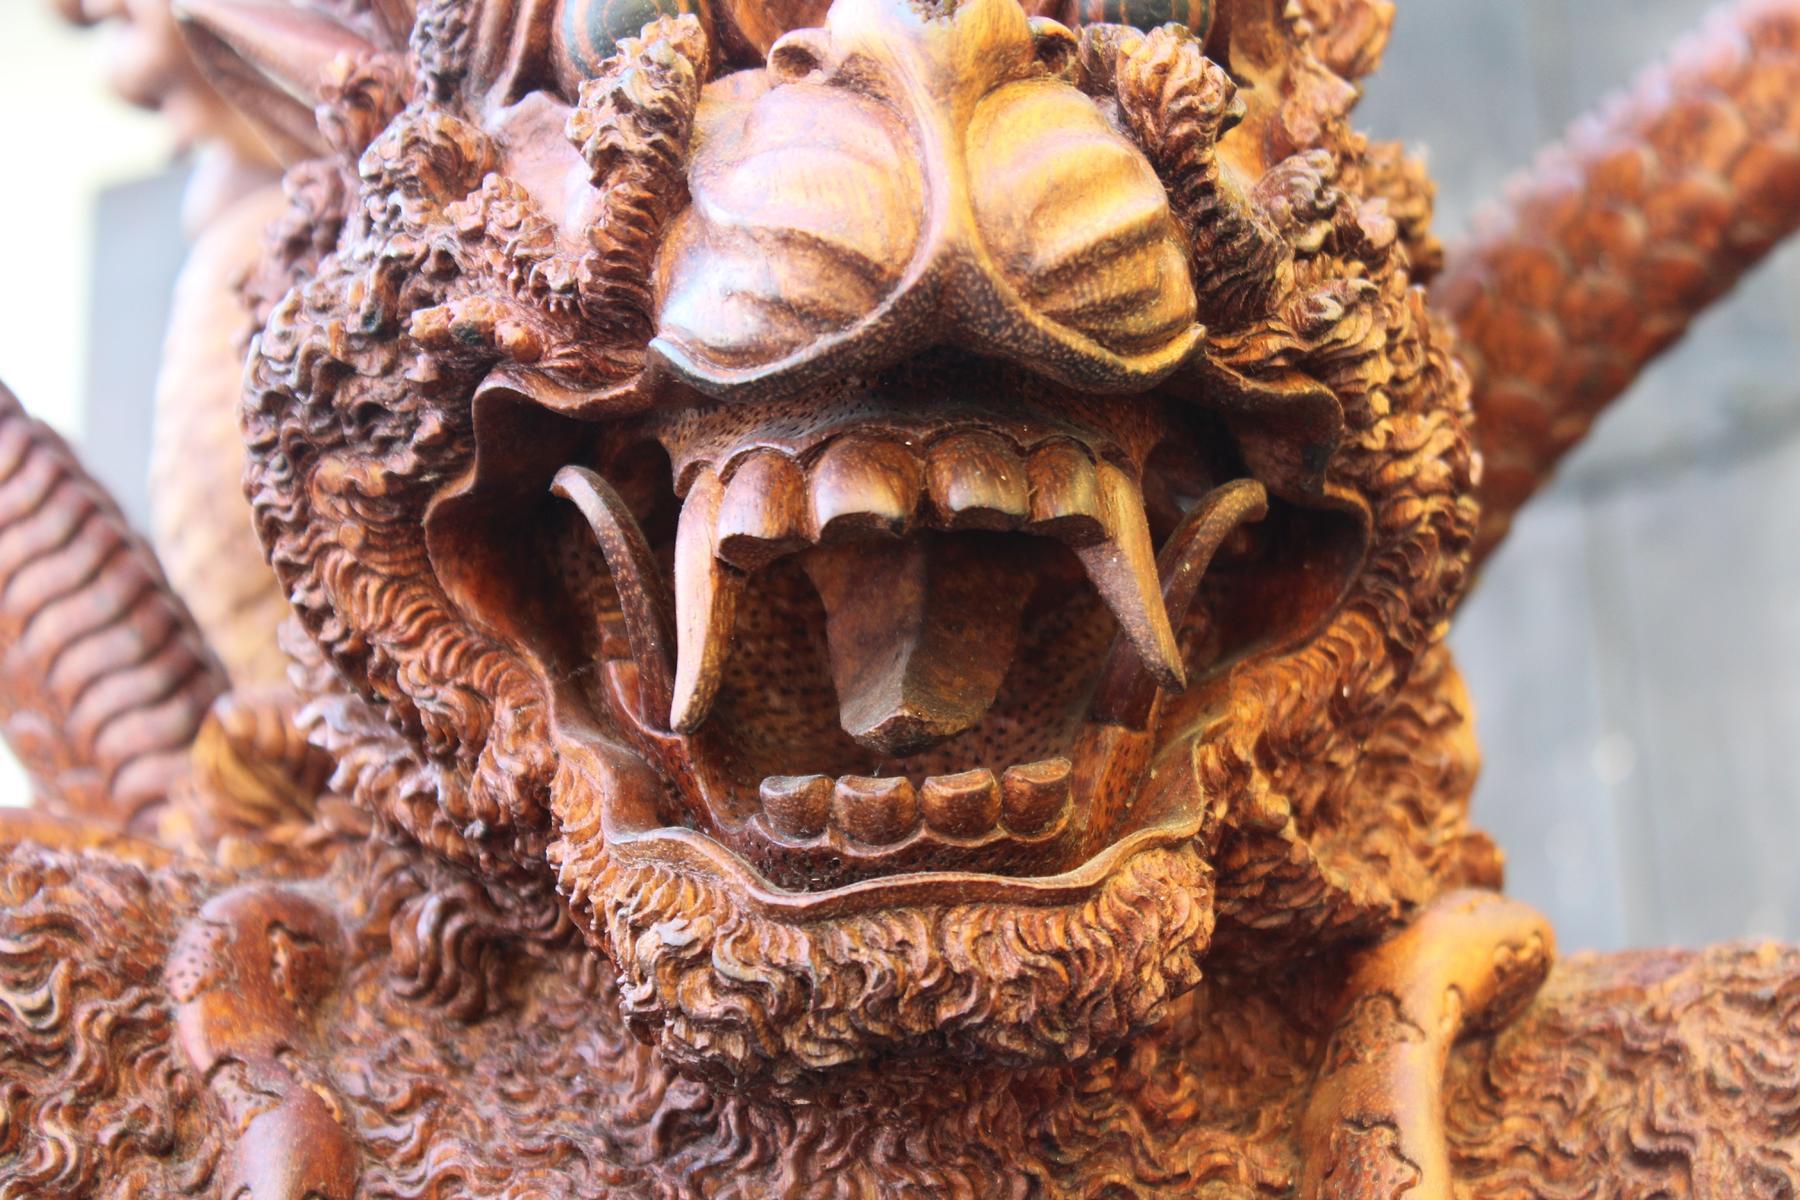 Große Holzskulptur, Indonesien / Bali, 2. Hälfte 20. Jahrhundert-6